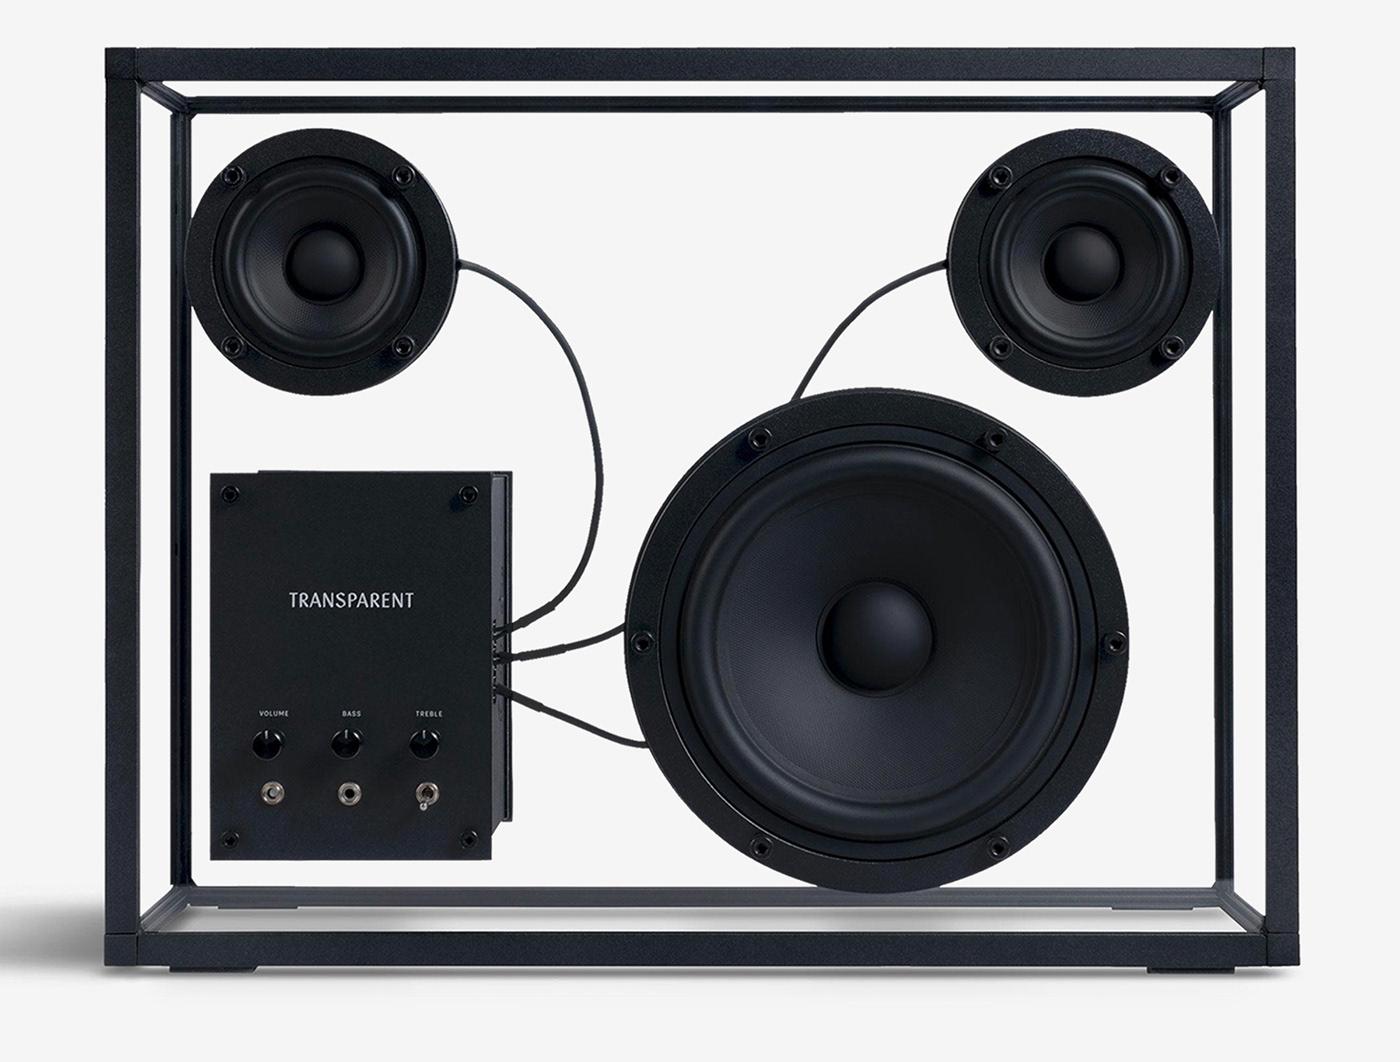 Bang&Olufsen Geneva interaction Marshall sennheiser Shure speaker transparent UI uxui